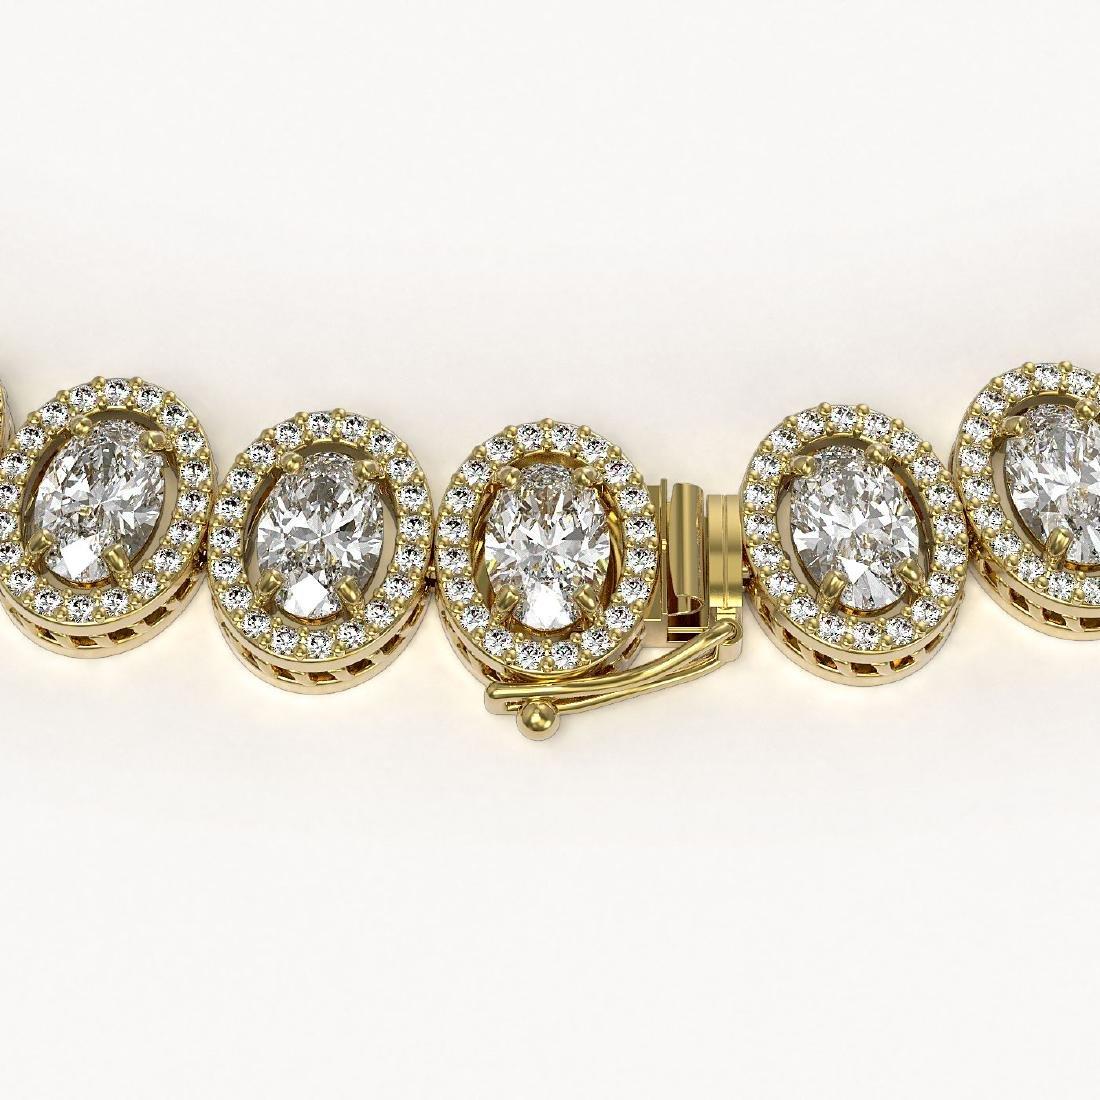 42.56 CTW Oval Diamond Designer Necklace 18K Yellow - 3